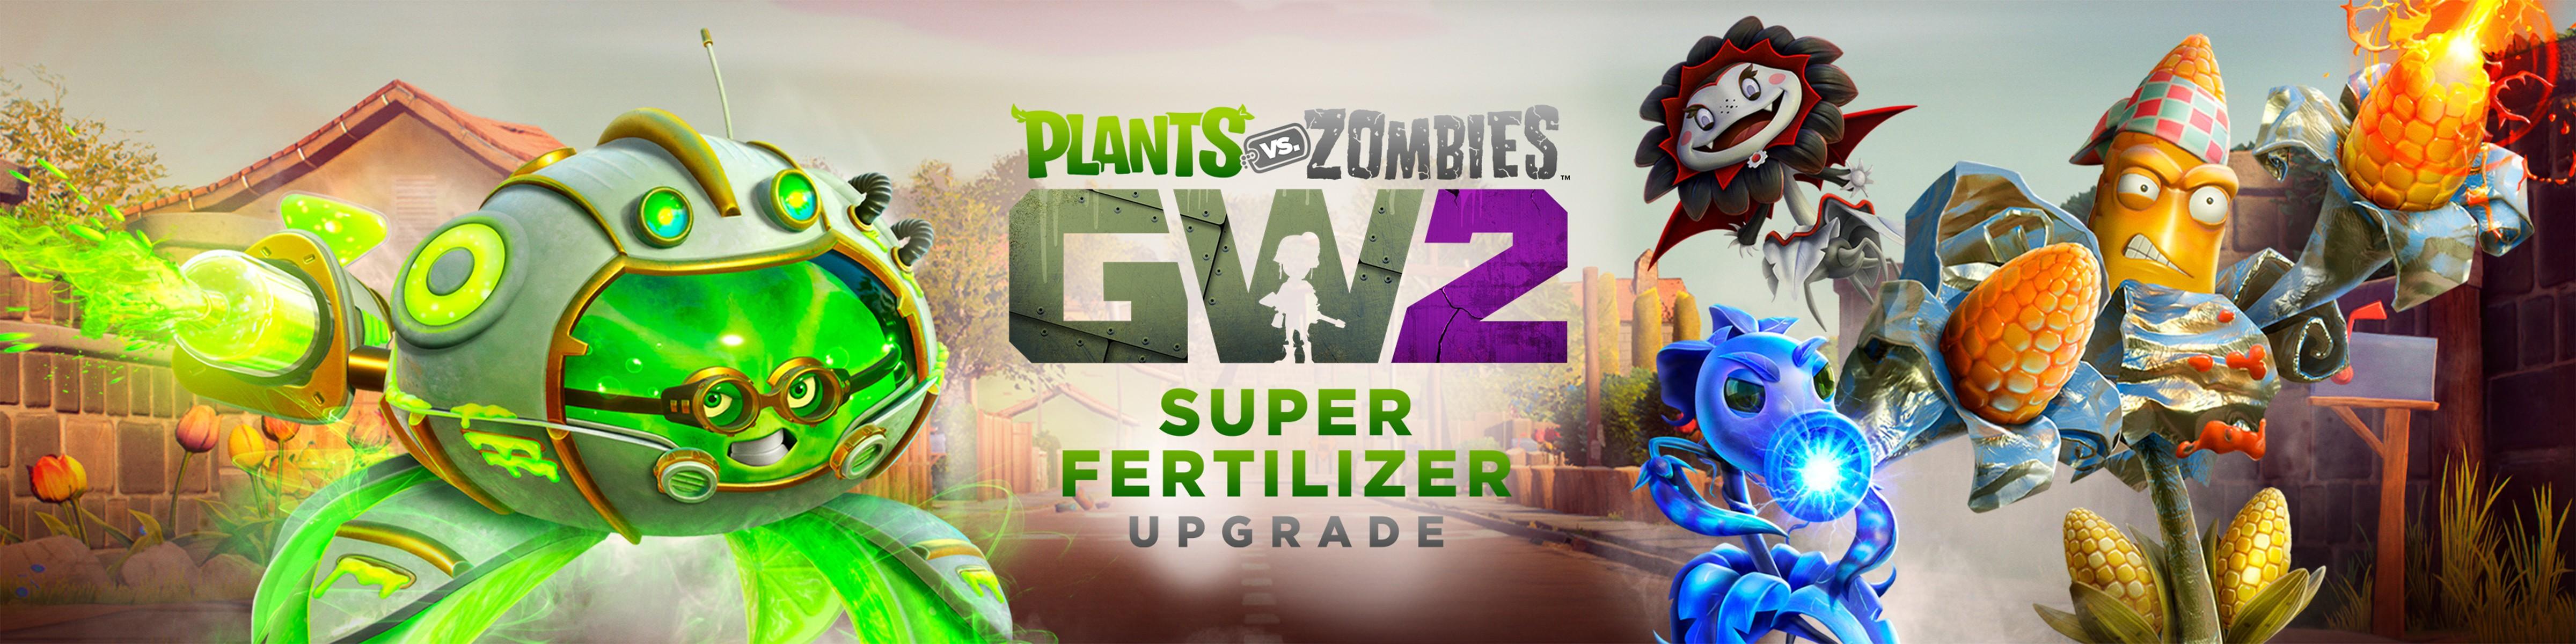 Plants Vs Zombies Garden Warfare 2 Super Fertilizer Upgrade